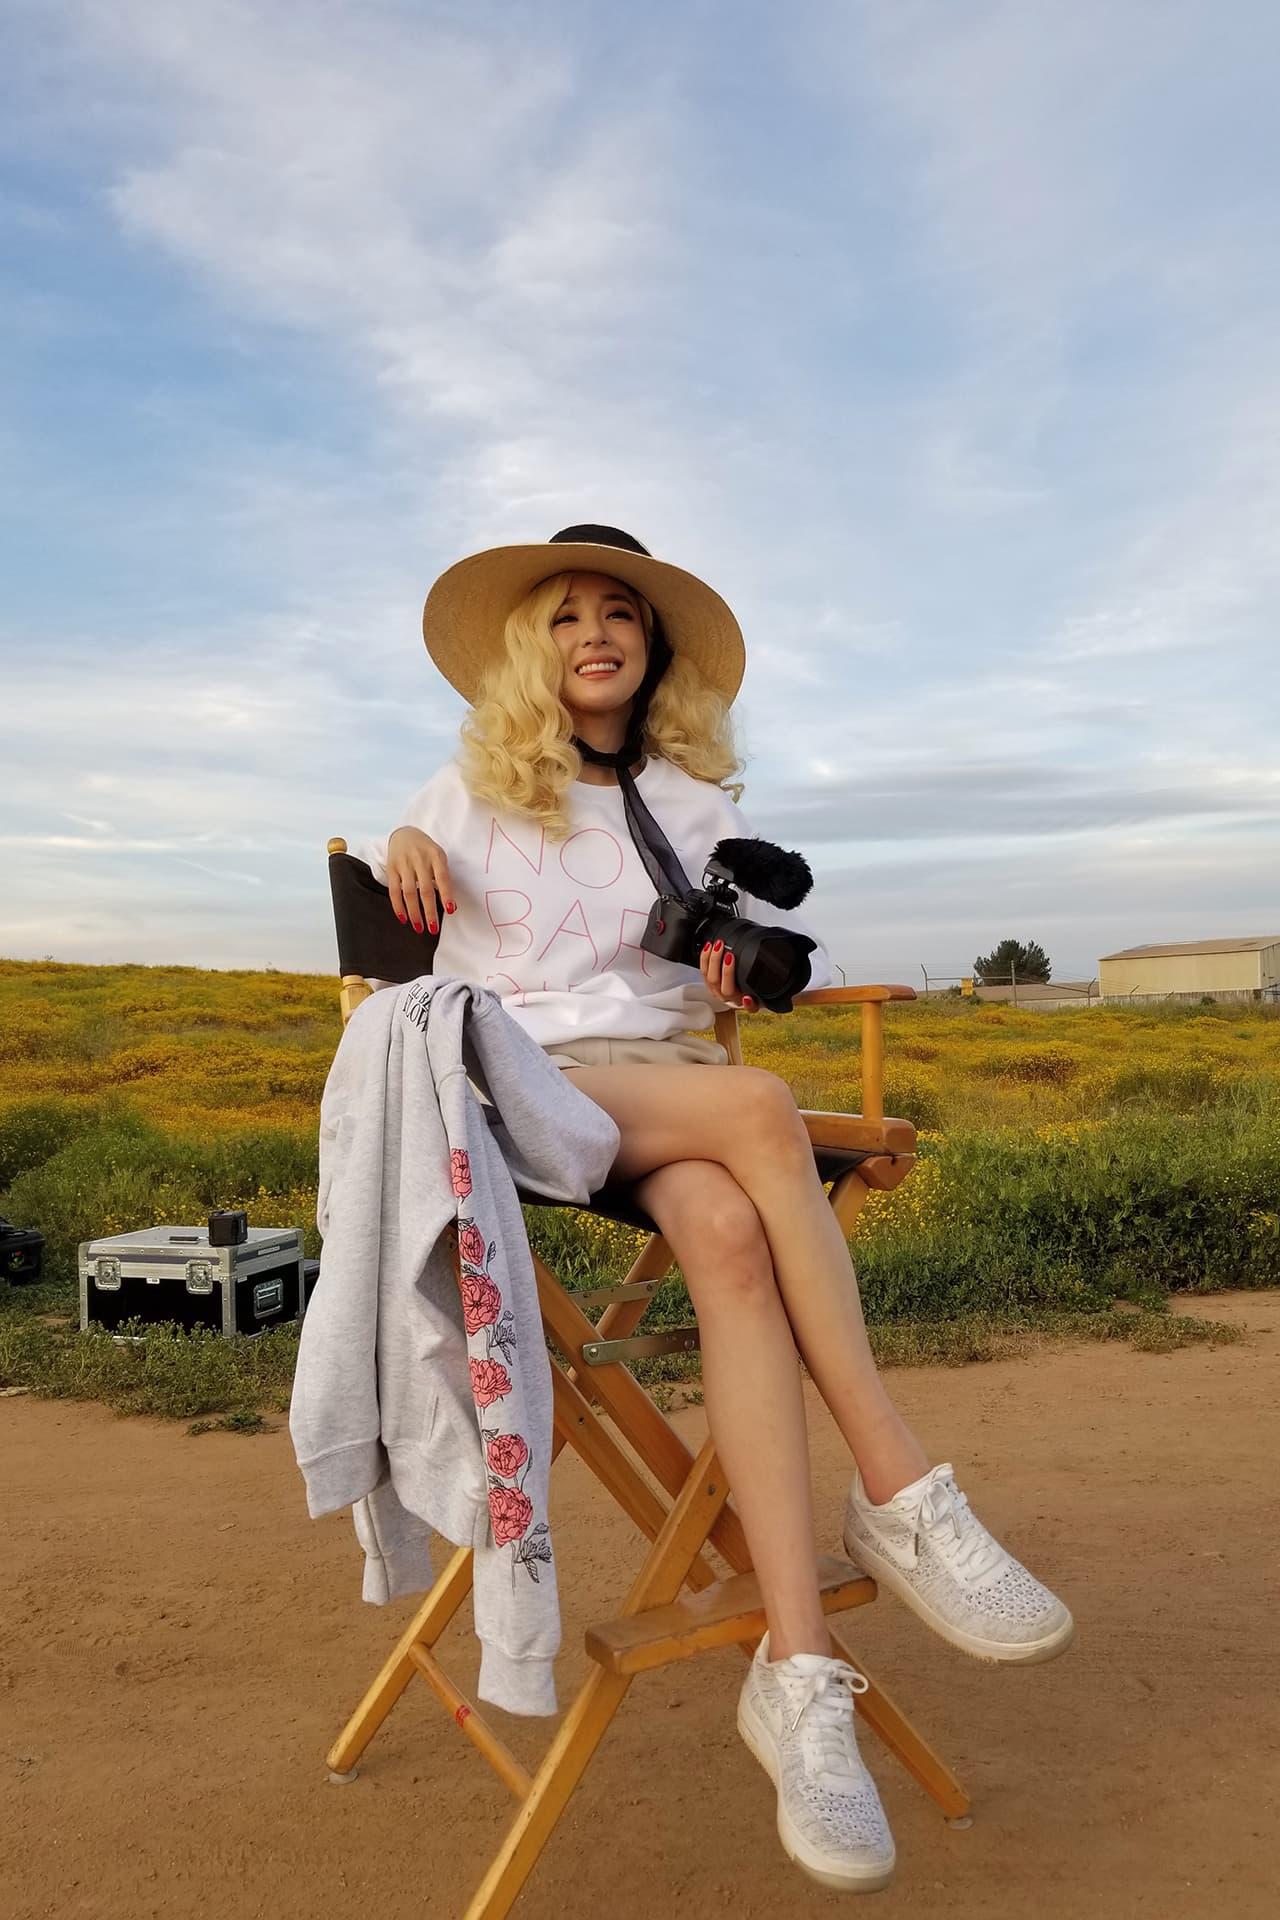 Tiffany Young K-pop Star Artist Singer Girls' Generation Not Barbie Merch T-Shirt Blonde Hair